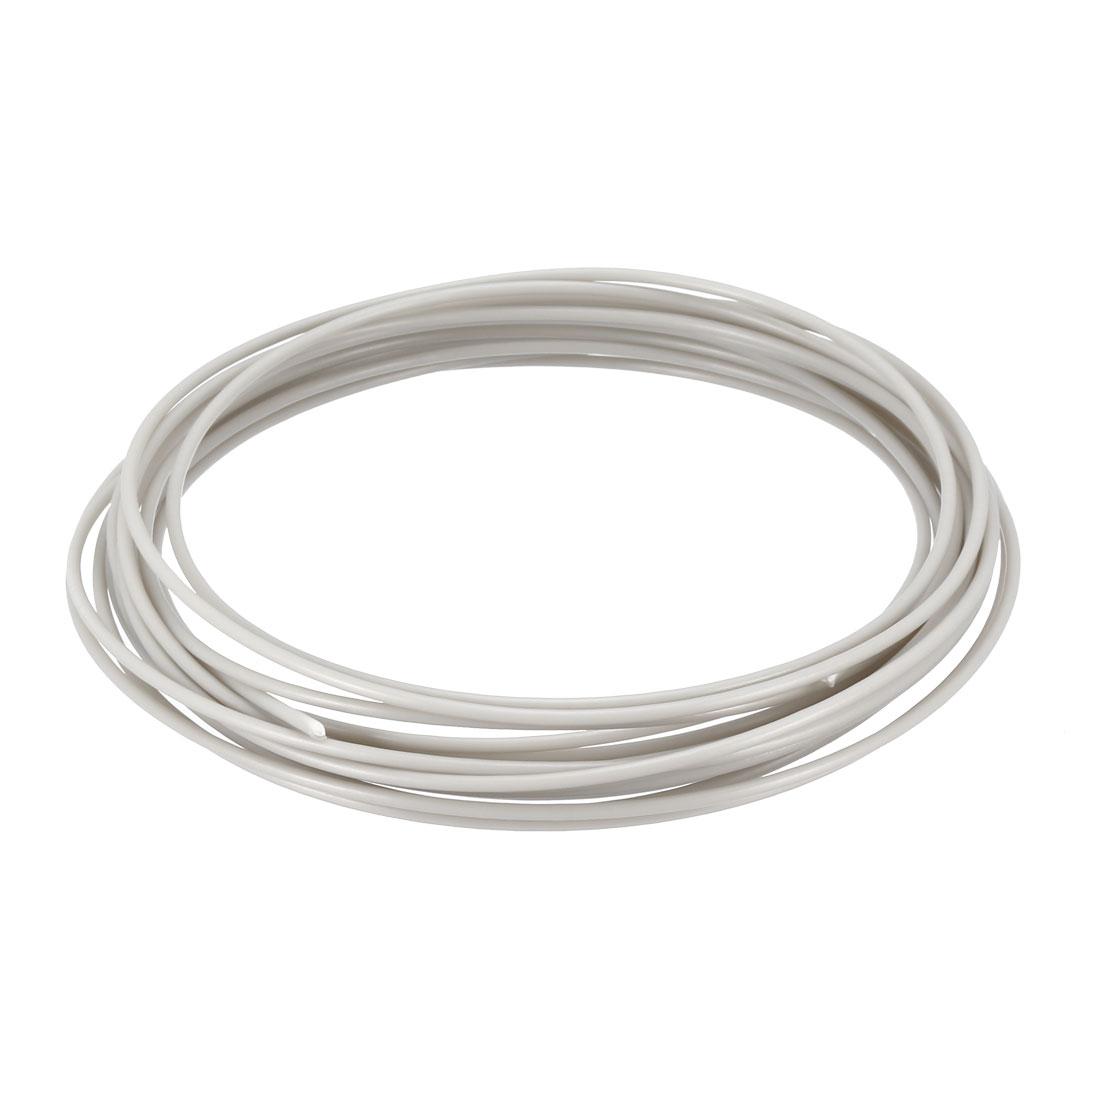 5 Meter/16 Ft ABS 3D Pen/3D Printer Filament, 1.75 mm Grey